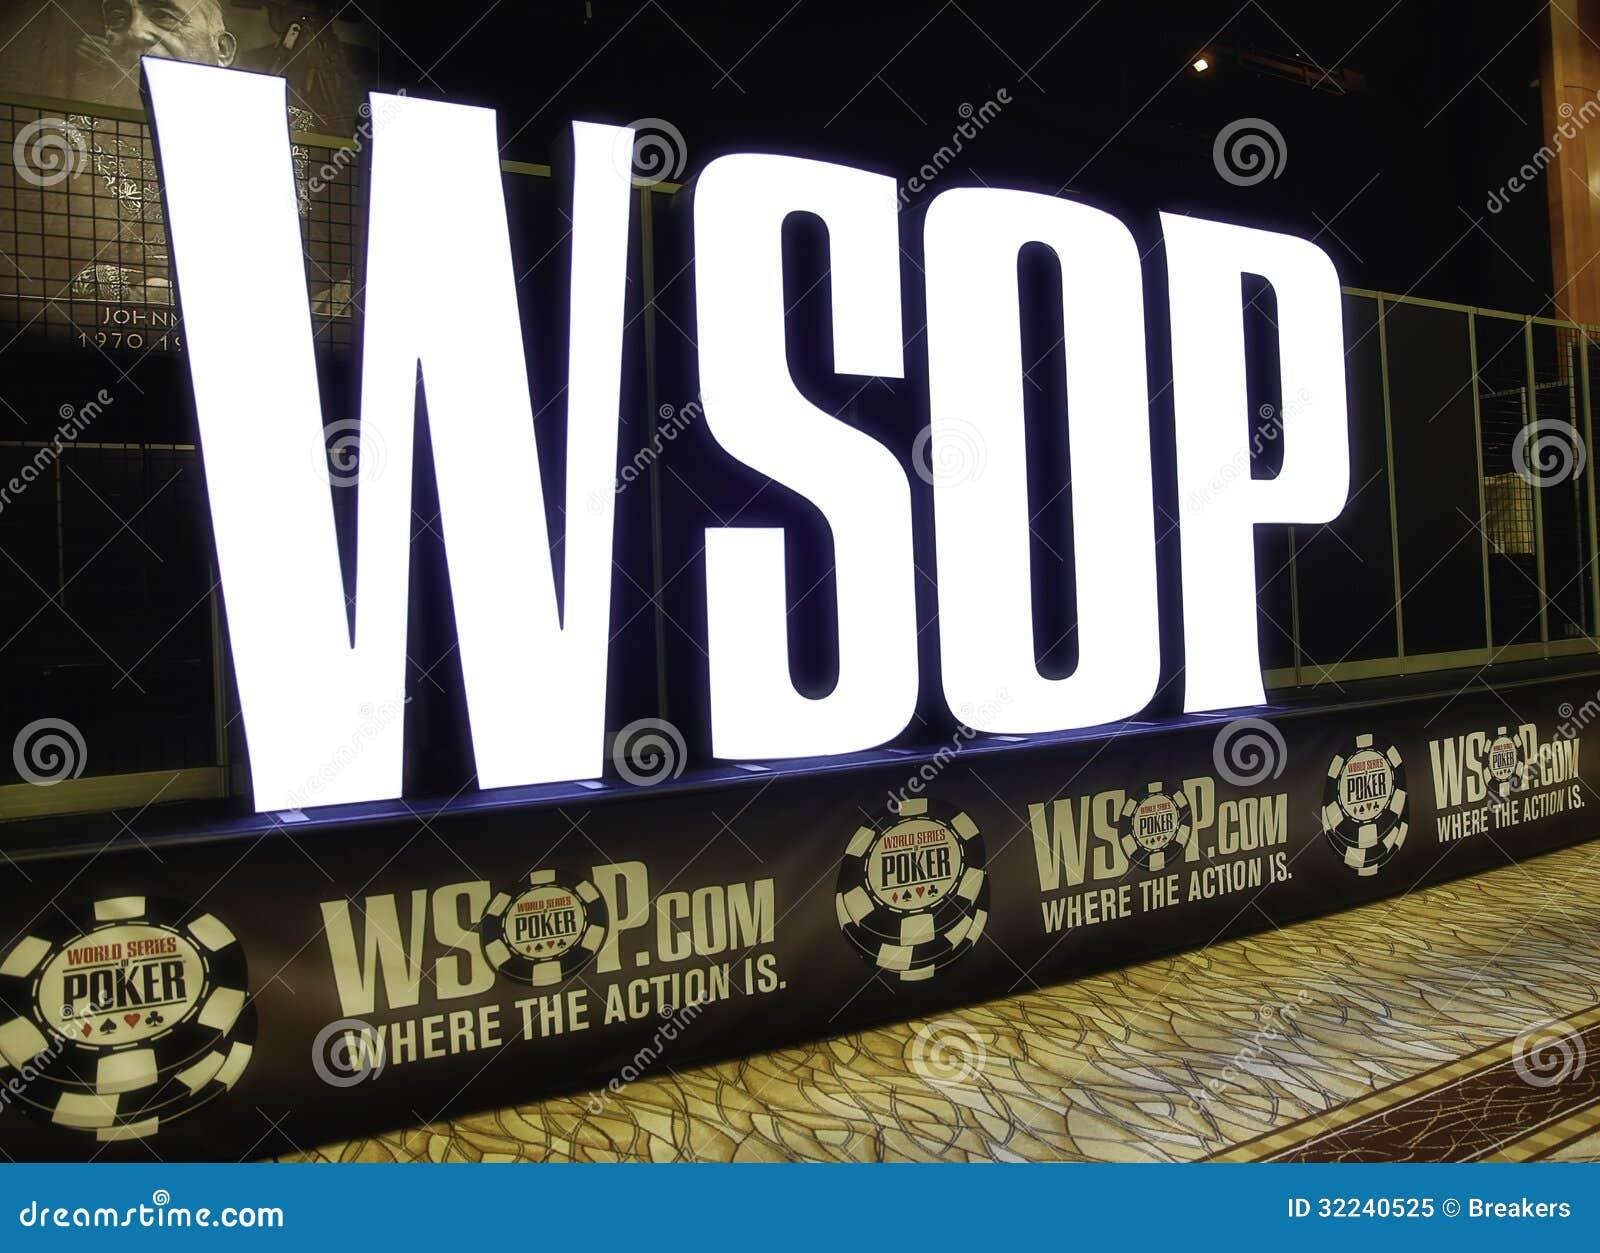 horseshoe casino poker room tournaments